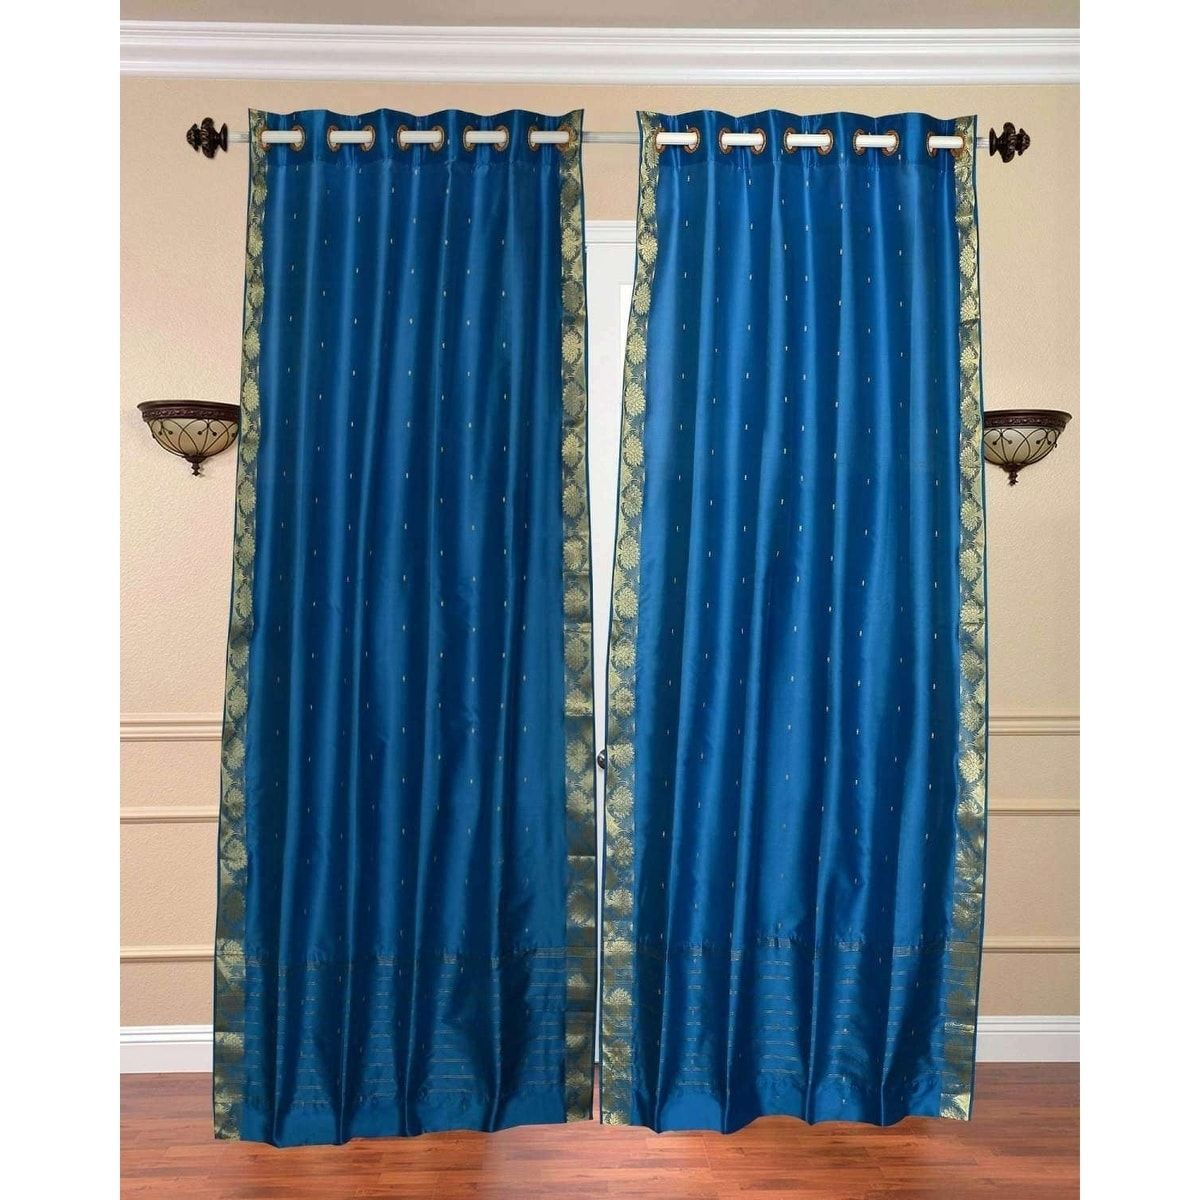 Indian Selections Turquoise Ring Top Sheer Sari Curtain / Drape ...